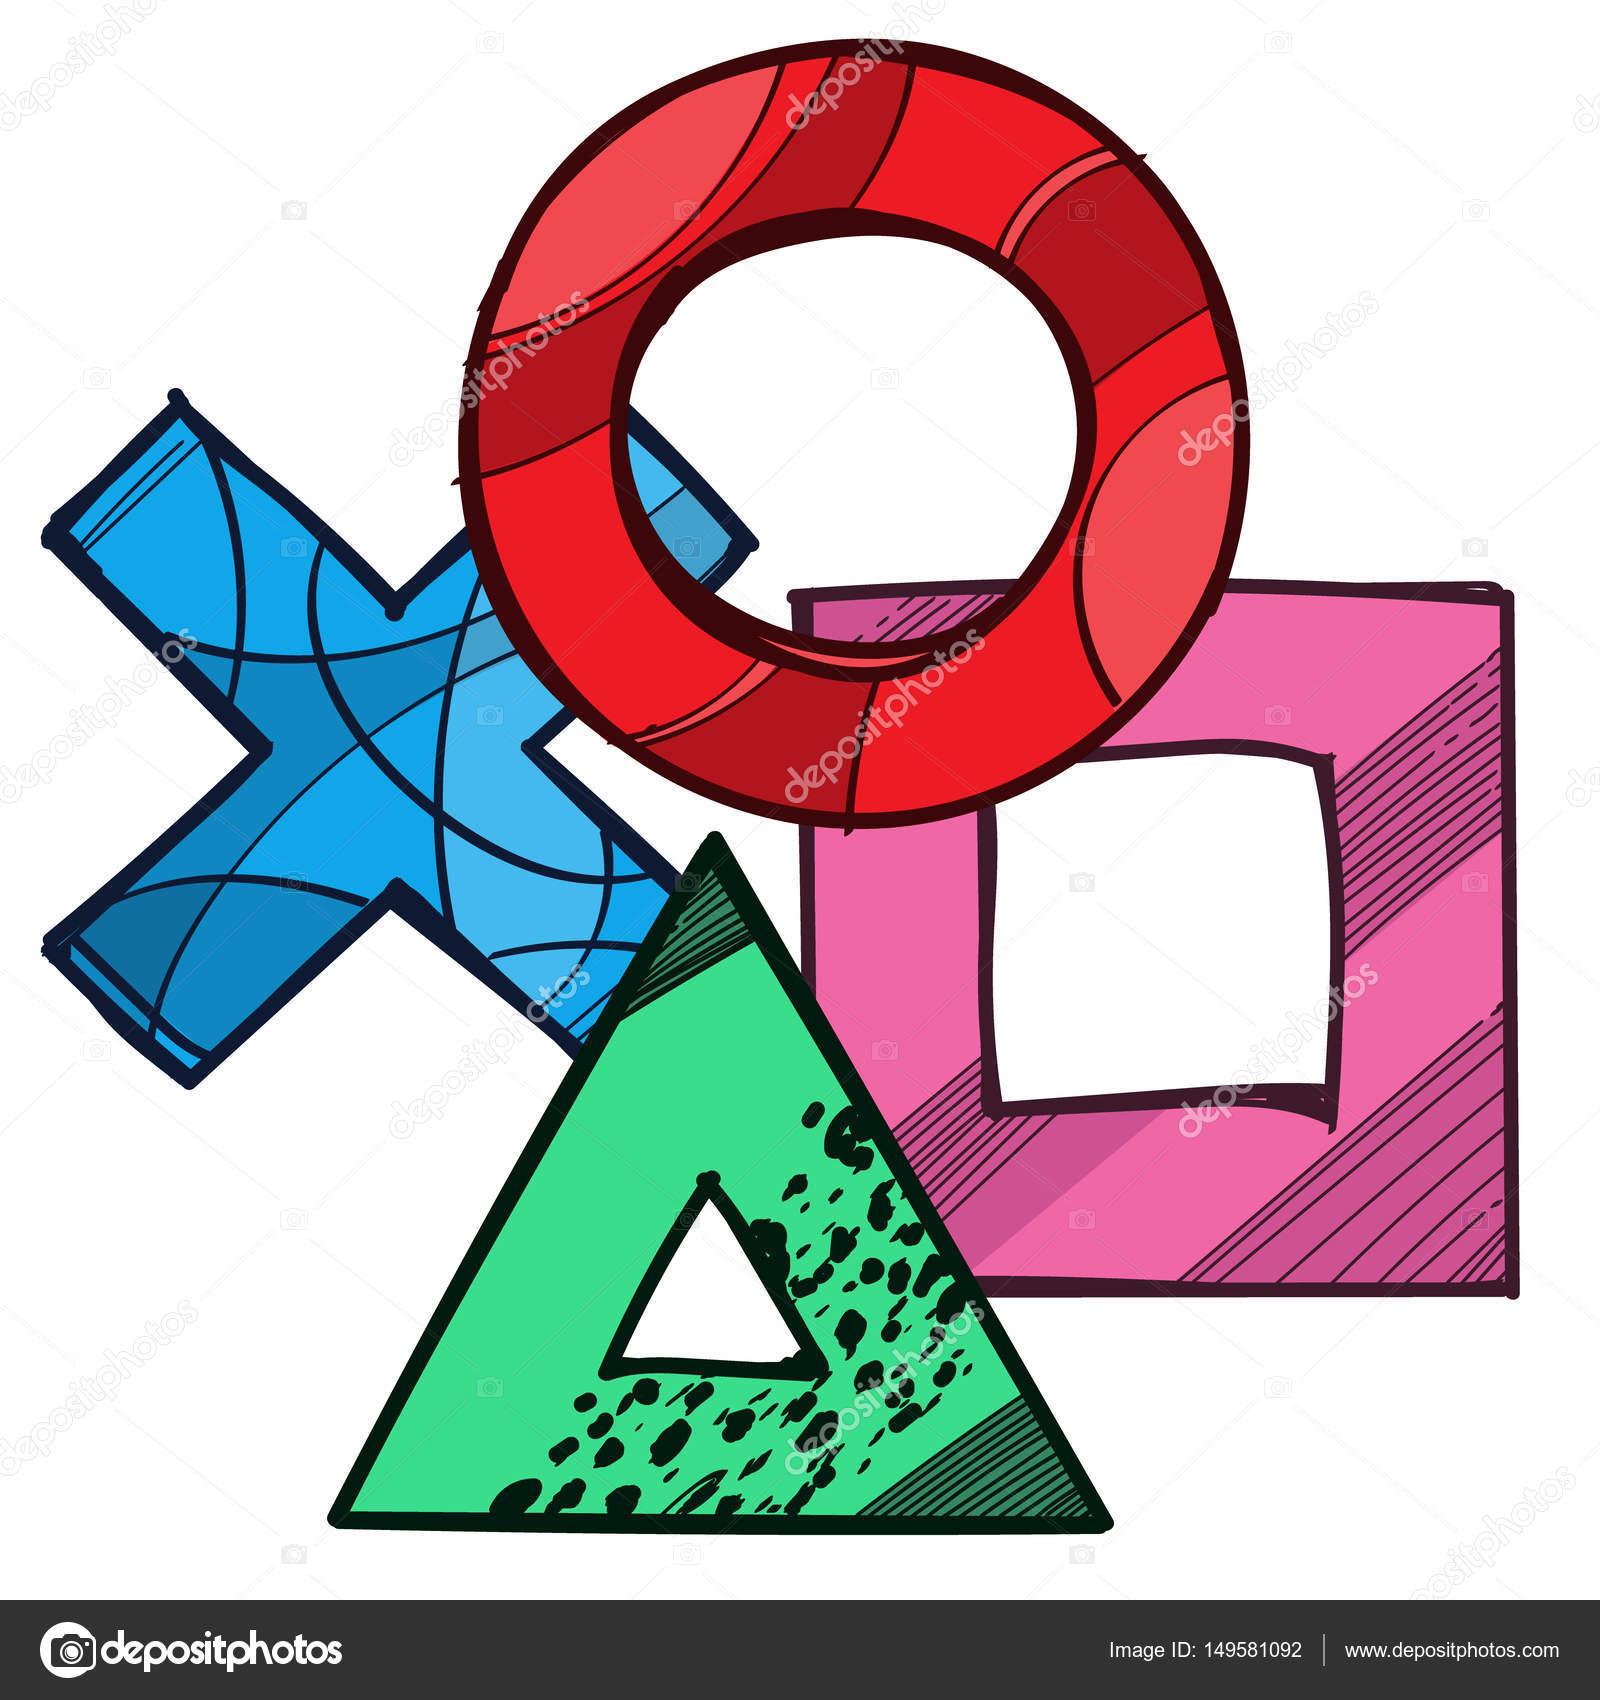 Cross Circle Square Triangle Game Pad Symbols Stock Vector